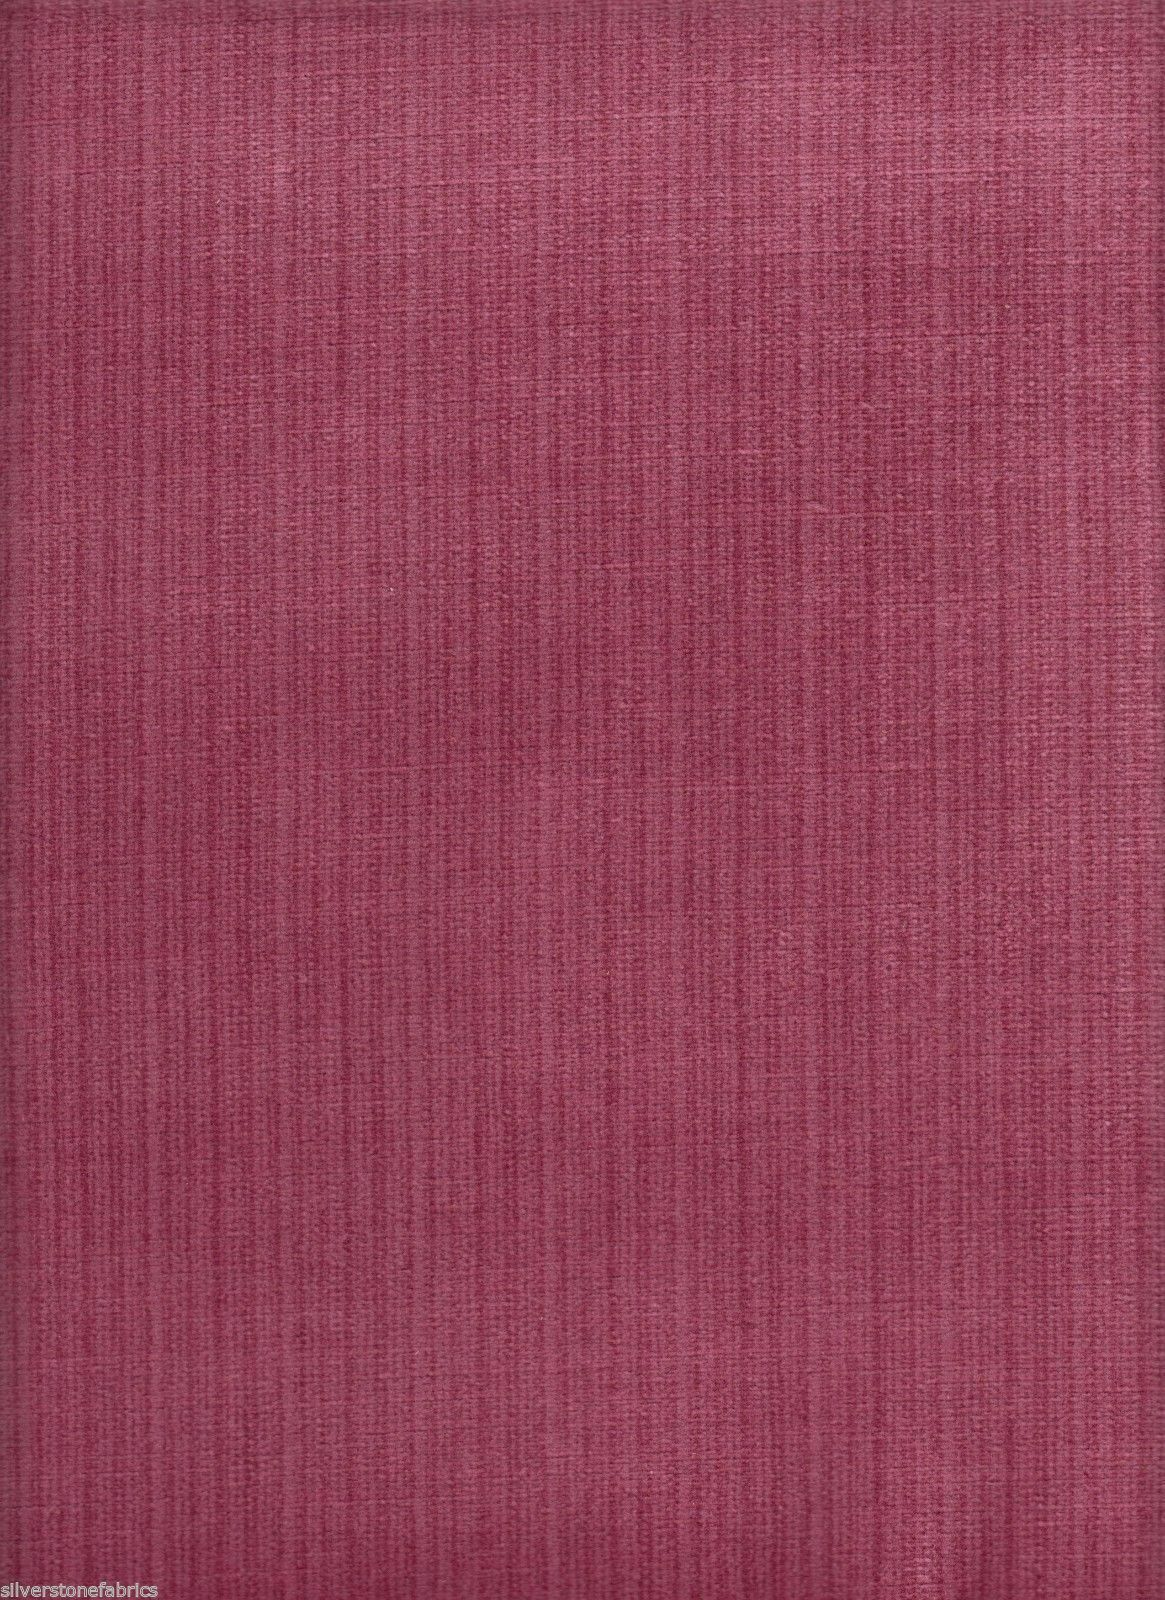 JB Martin Upholstery Fabric Pink Stria Textured Velvet 8.5 yds BH